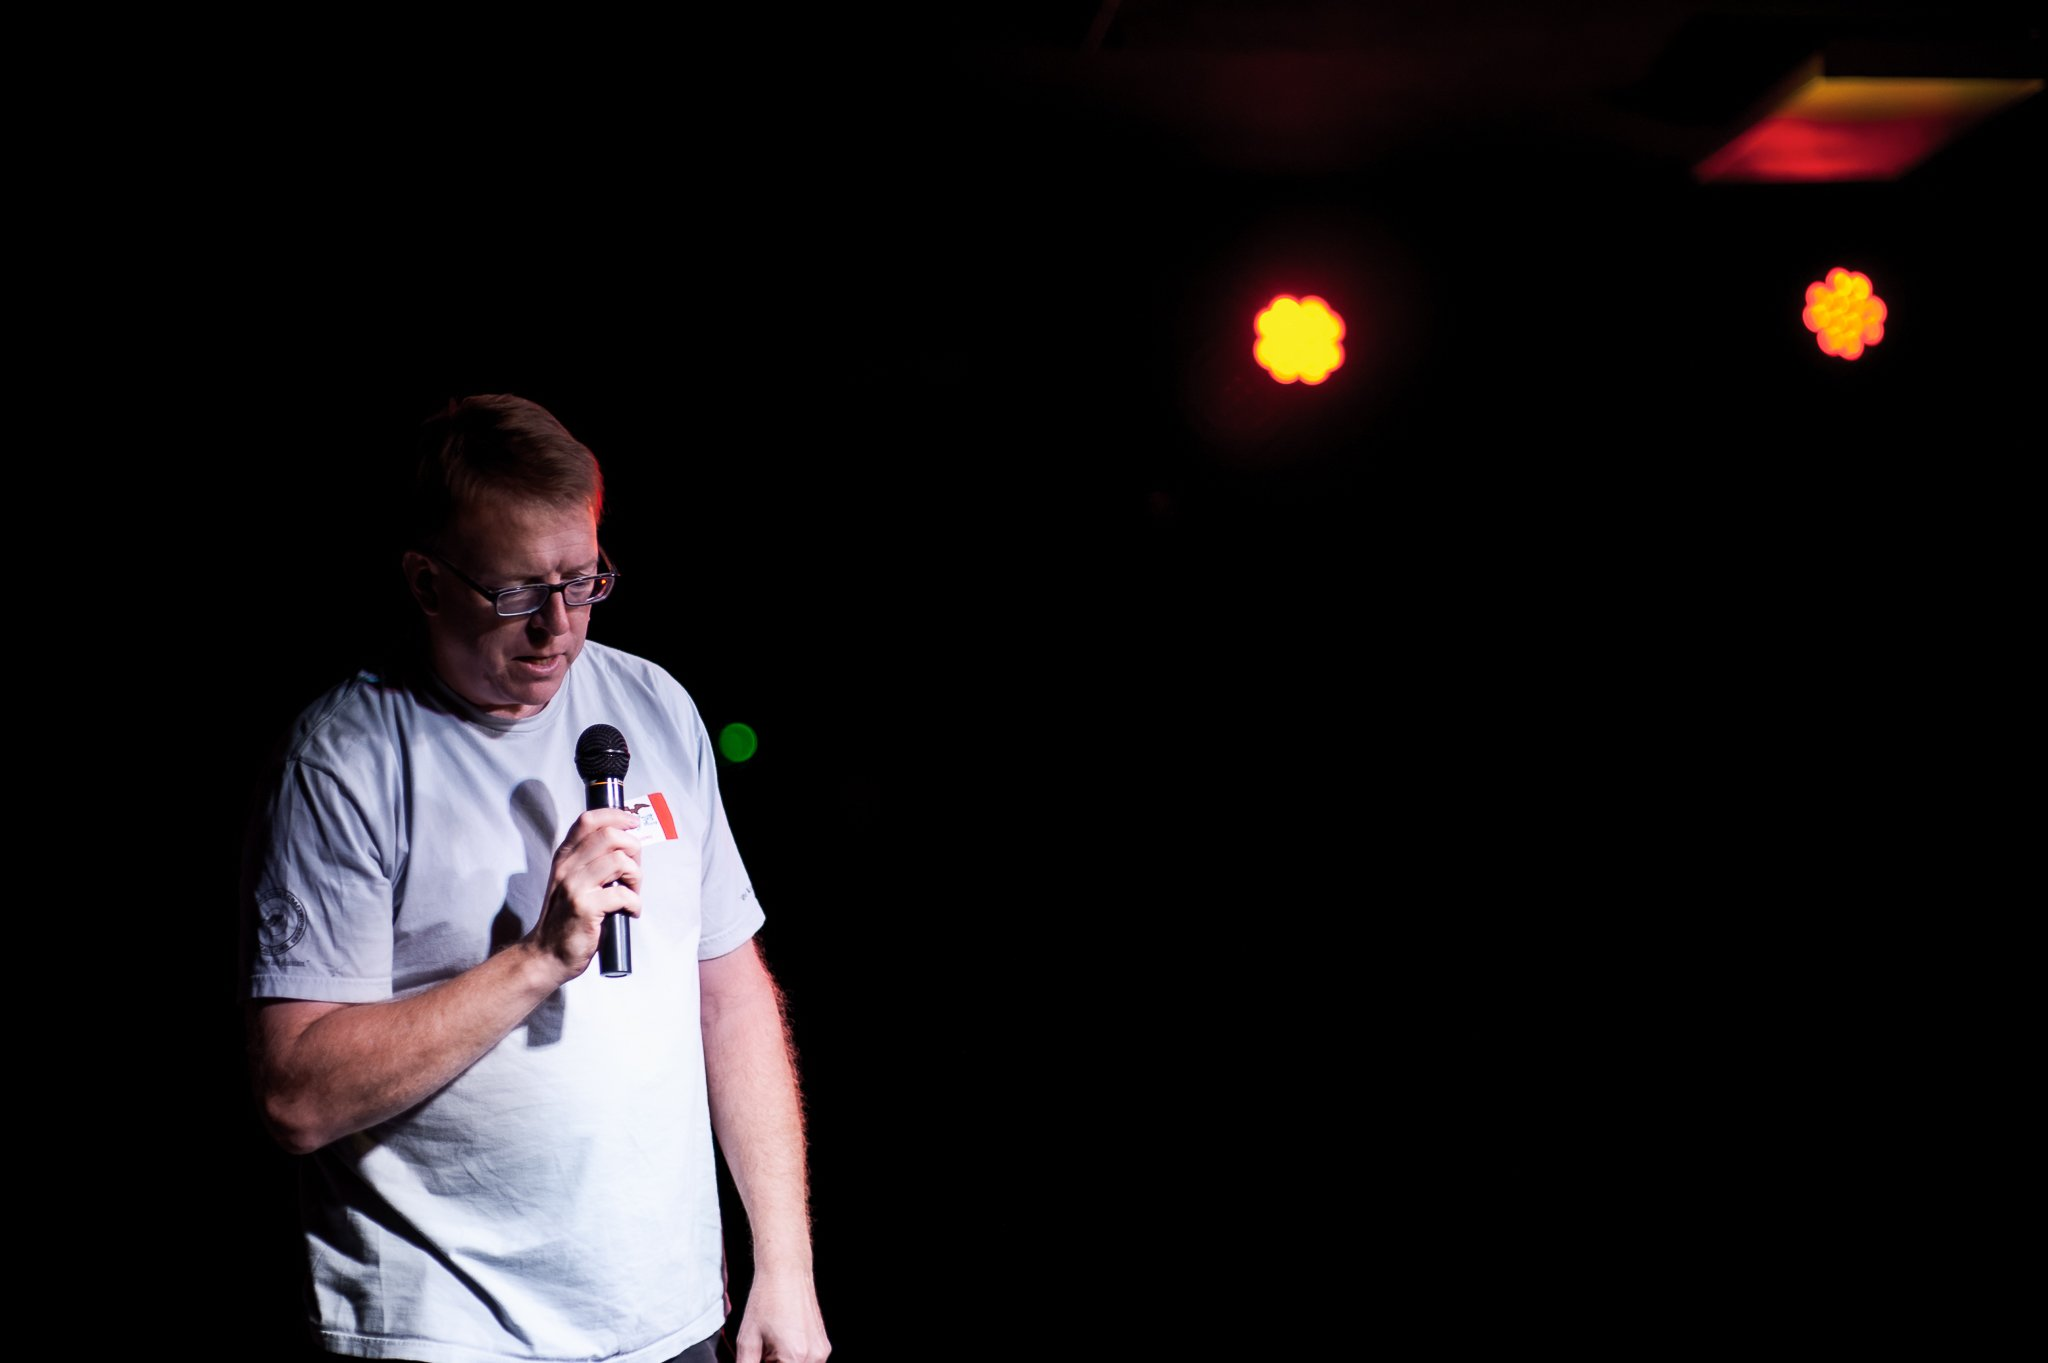 State Representative Rob Hogg at State Representative Liz Bennett's Celebrity Karaoke Night Fundraiser